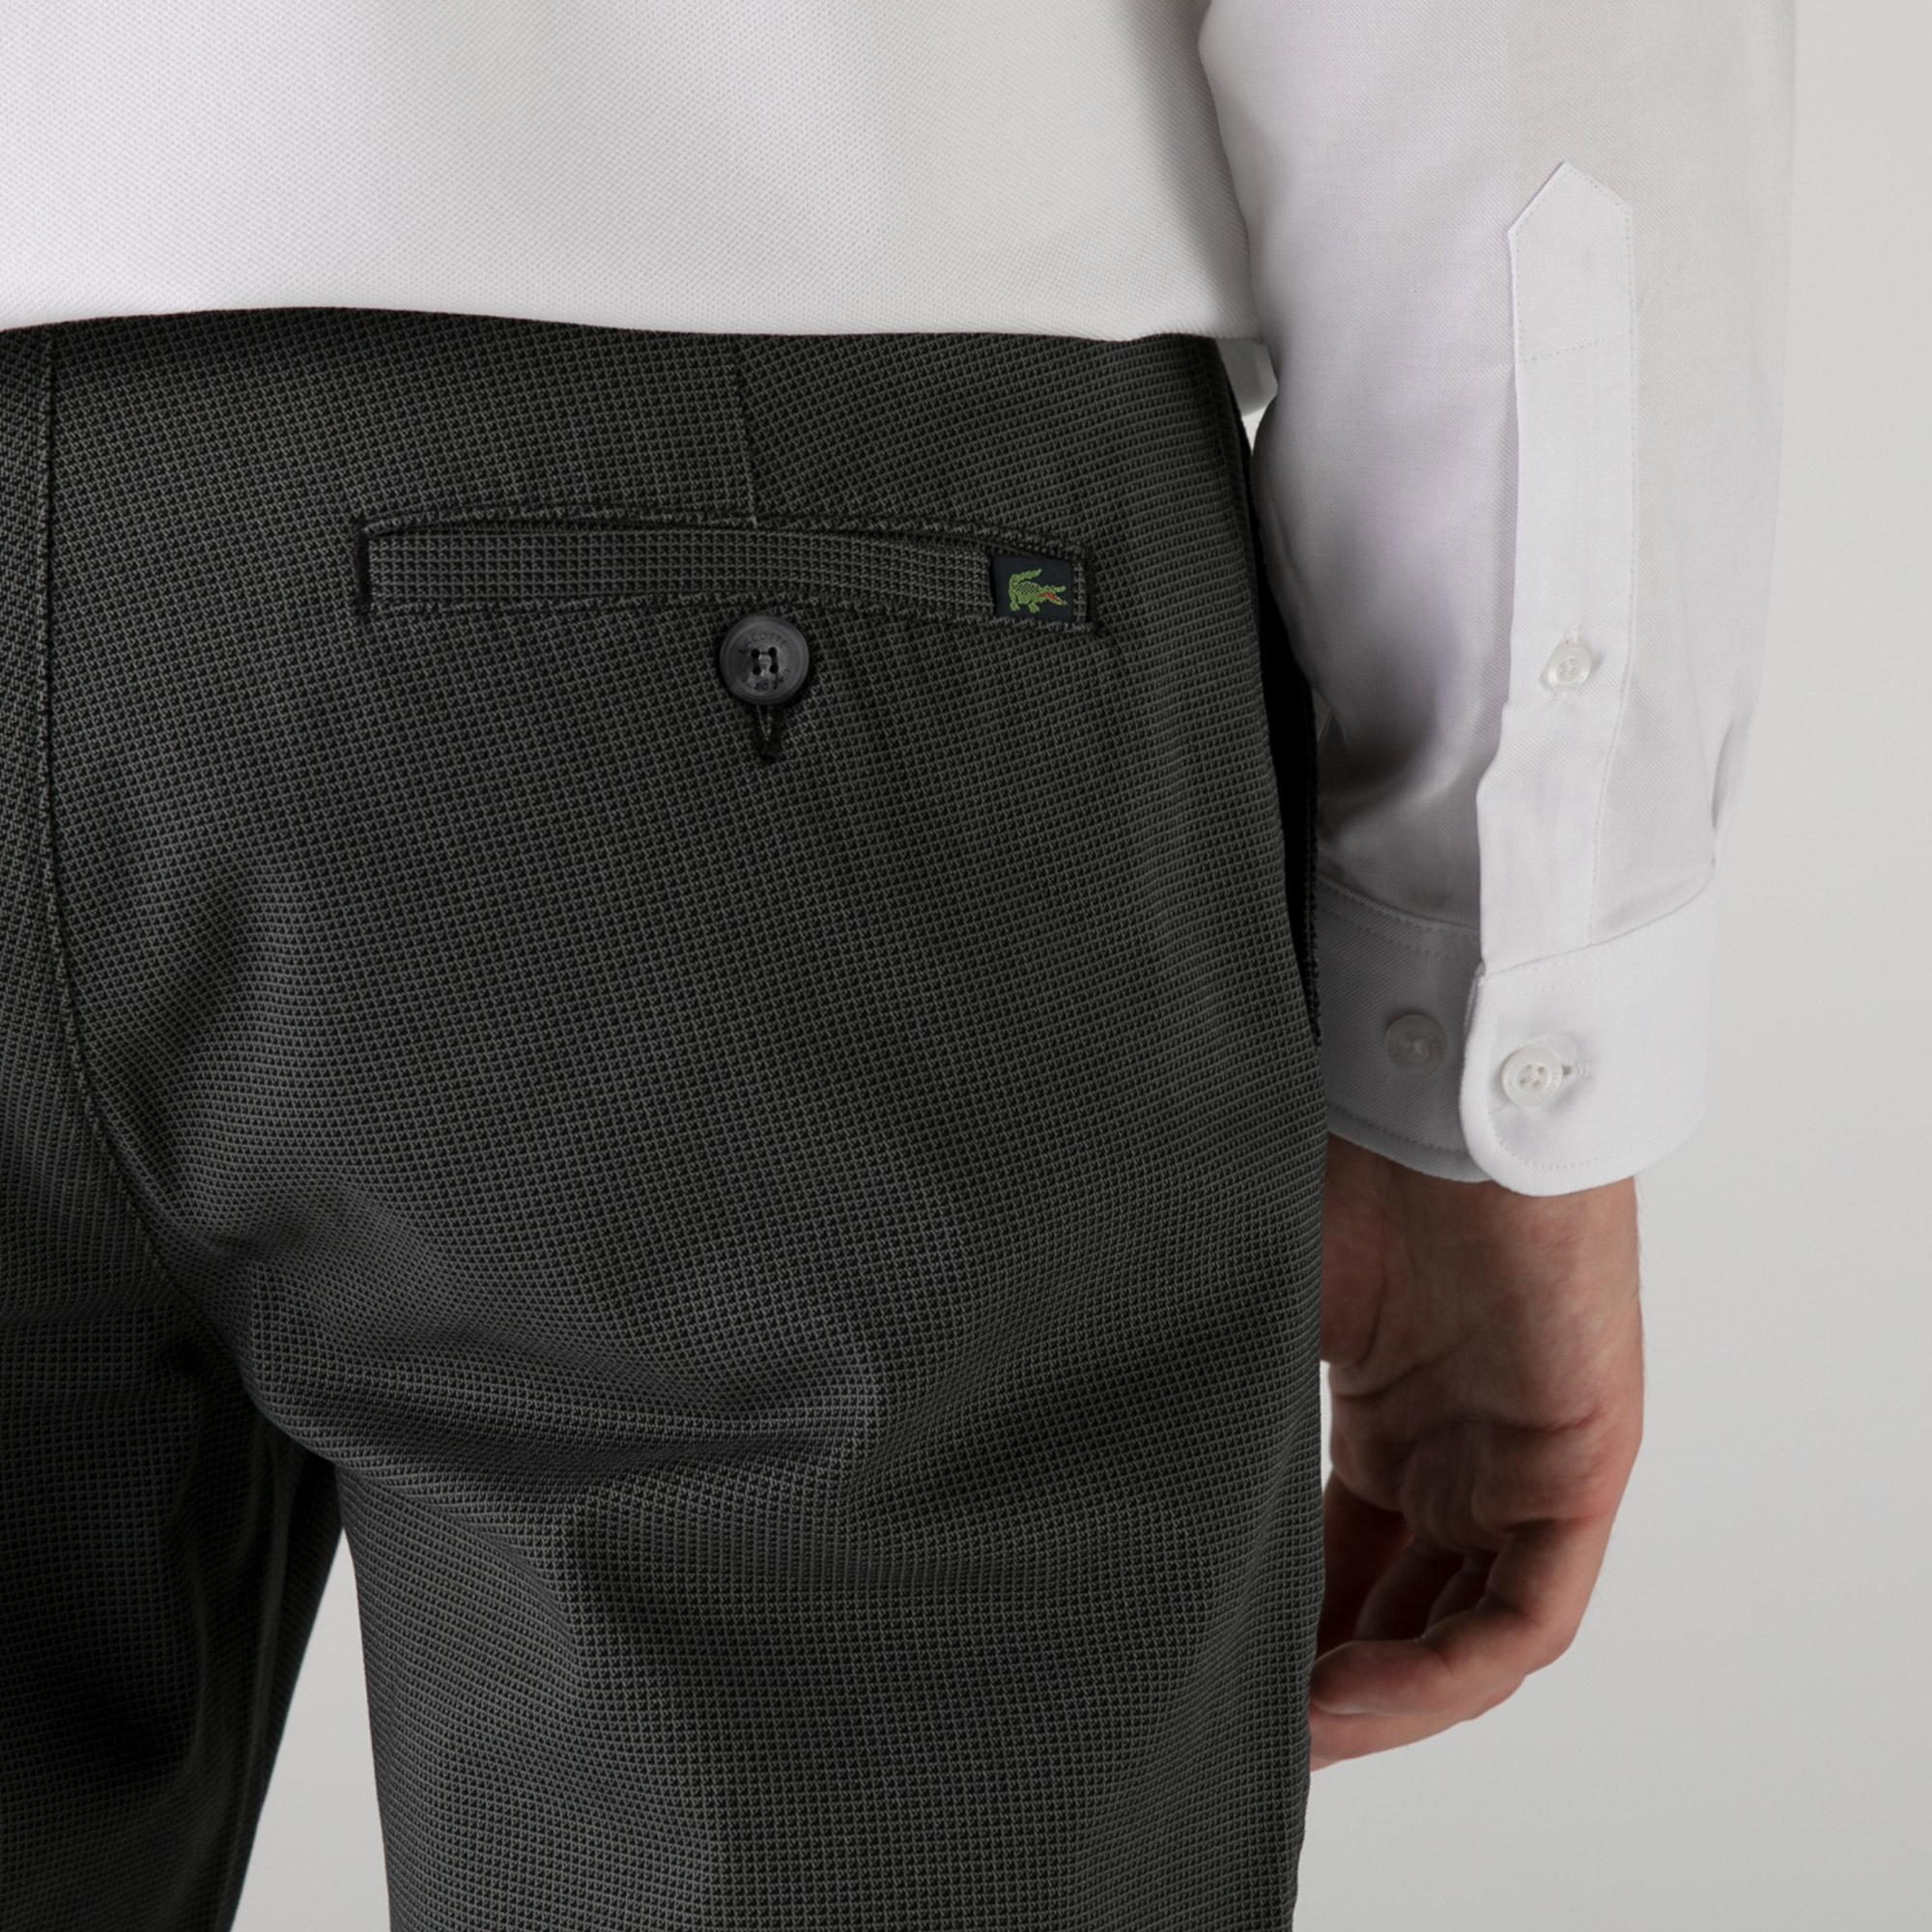 Lacoste Erkek Slim Fit Desenli Siyah Pantolon